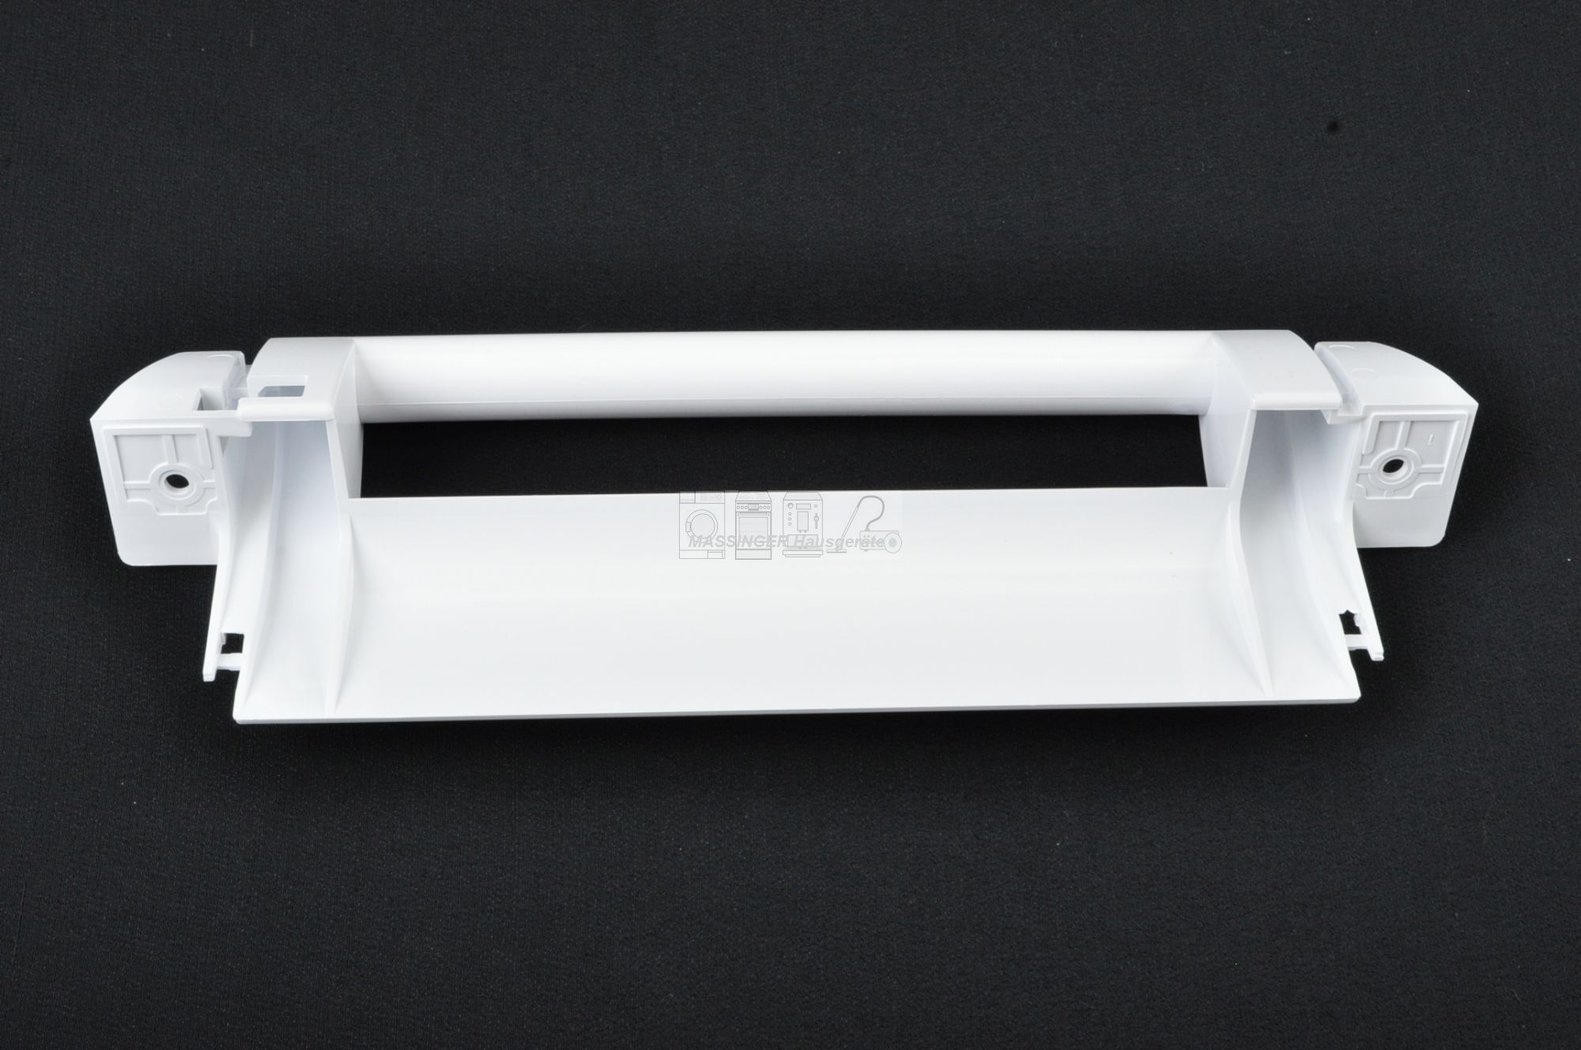 481246268979 t r hand griff gefrier truhe bauknecht whirlpool. Black Bedroom Furniture Sets. Home Design Ideas